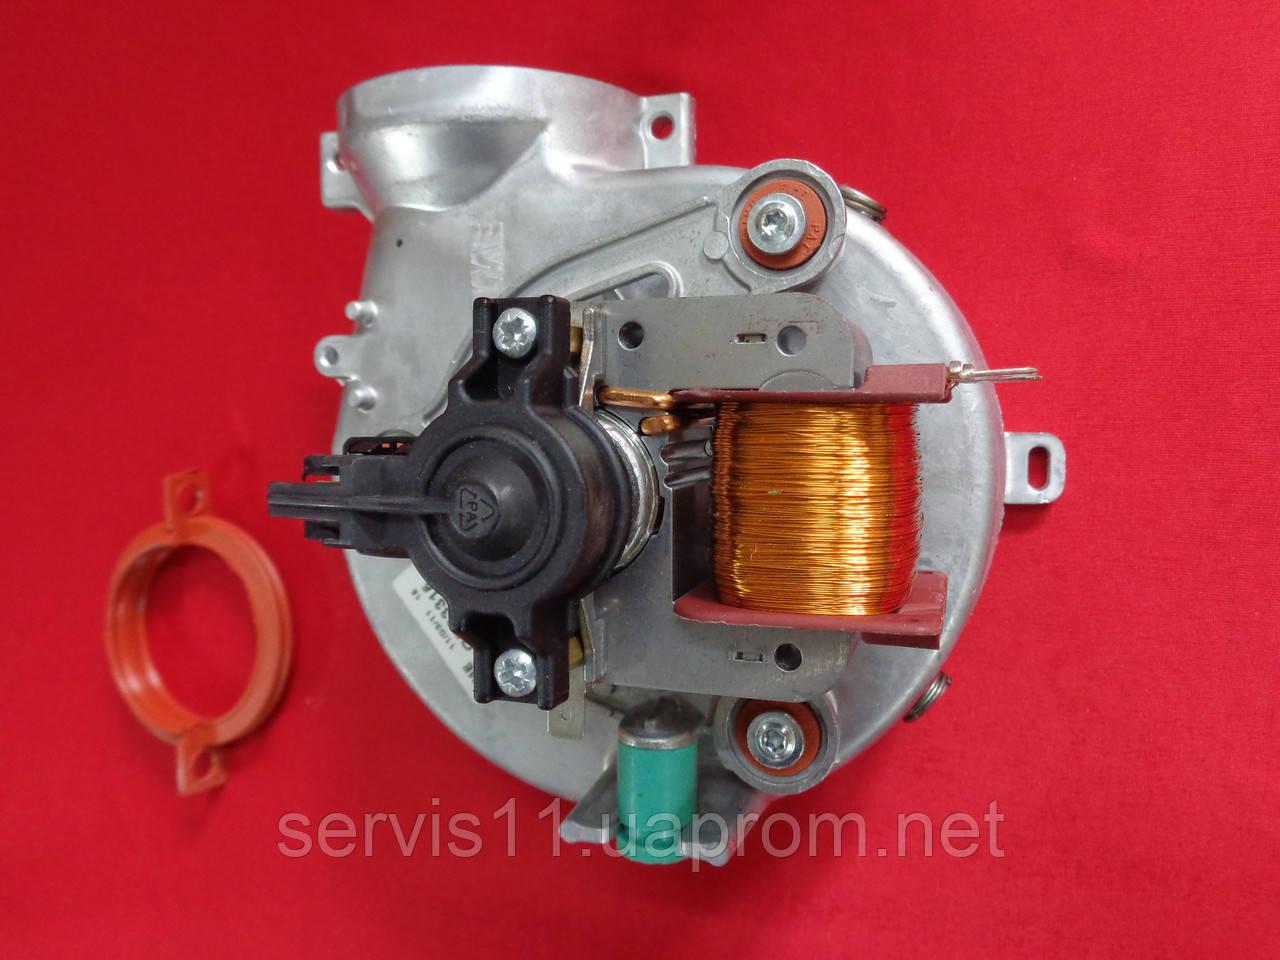 Вентилятор Ariston Genus 24 FF